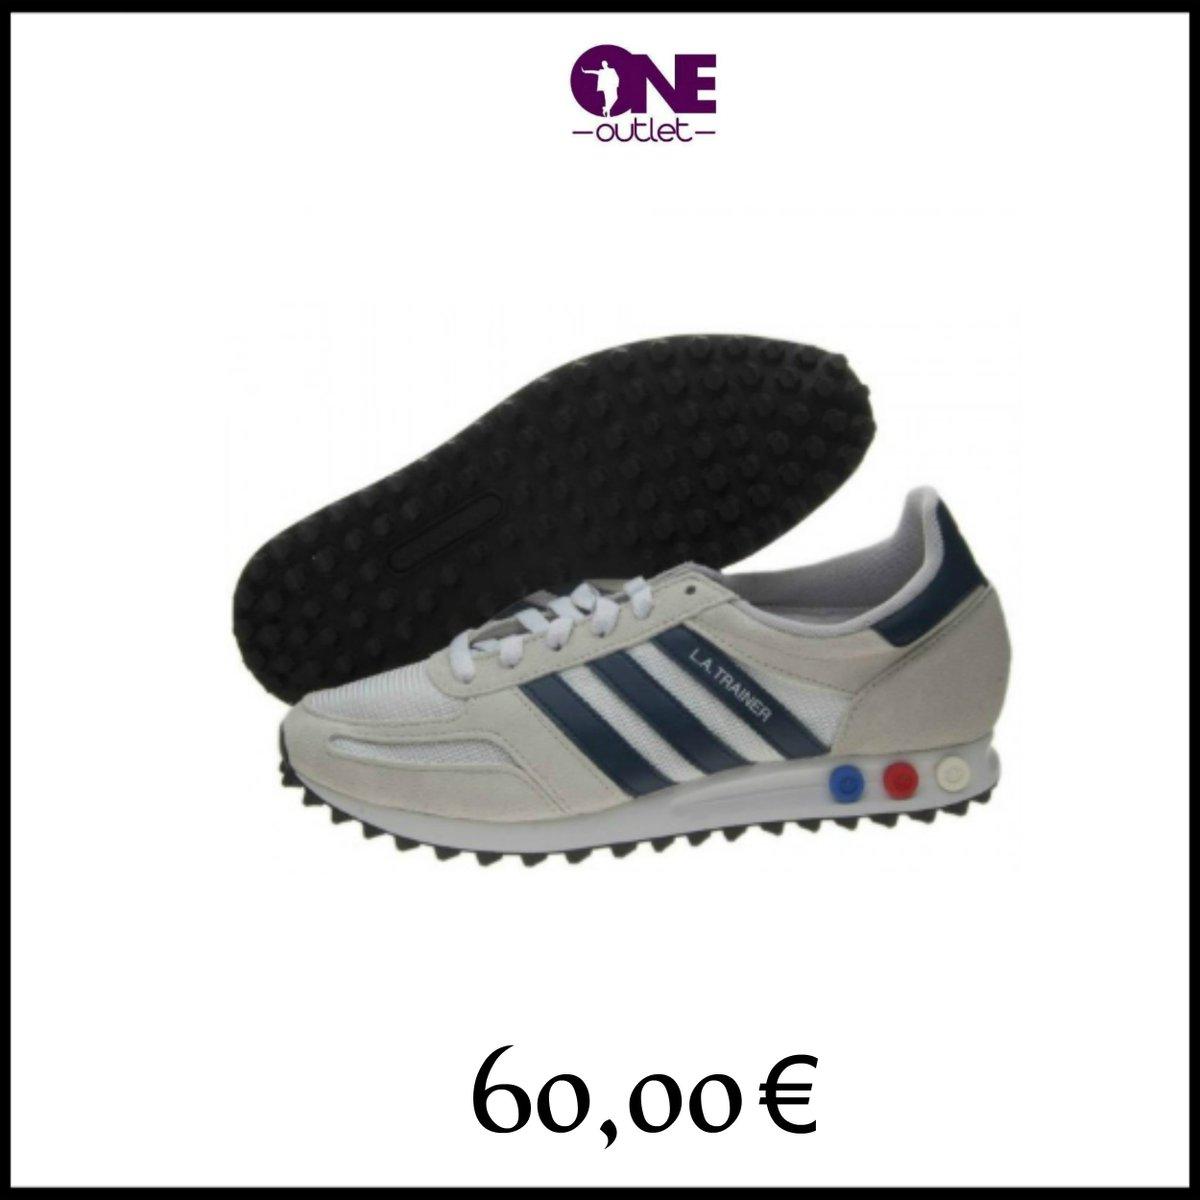 separation shoes 5ff13 4de4b  adidas la trainer traola Twitterren